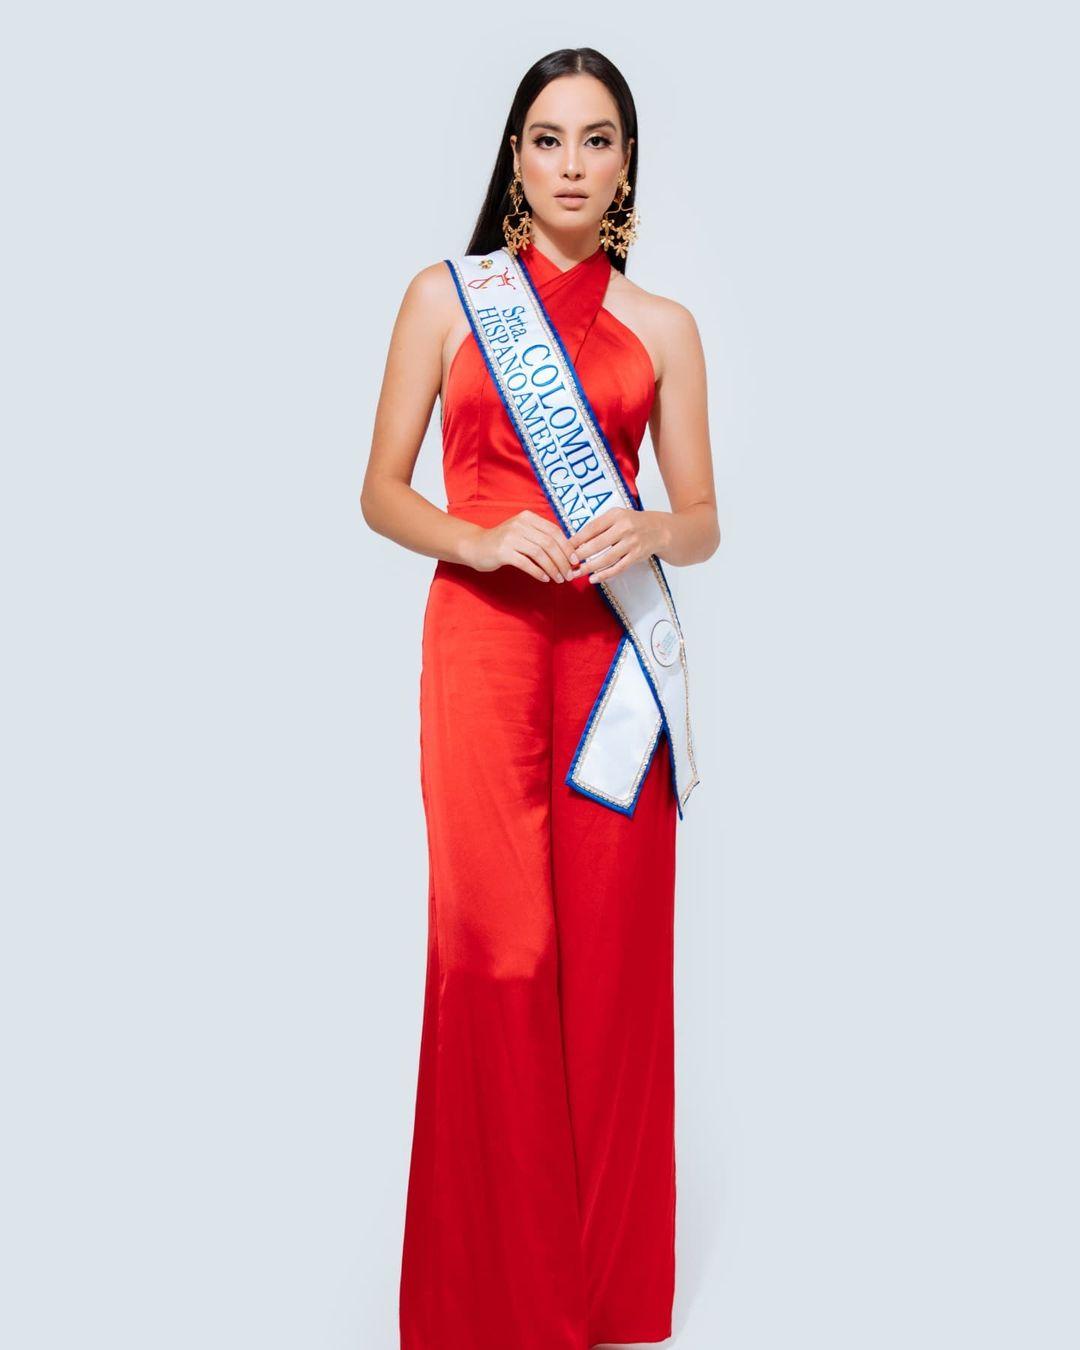 maria alejandra vengoechea, miss colombia hispanoamericana 2021/3rd runner-up de miss international 2019. - Página 14 23480212